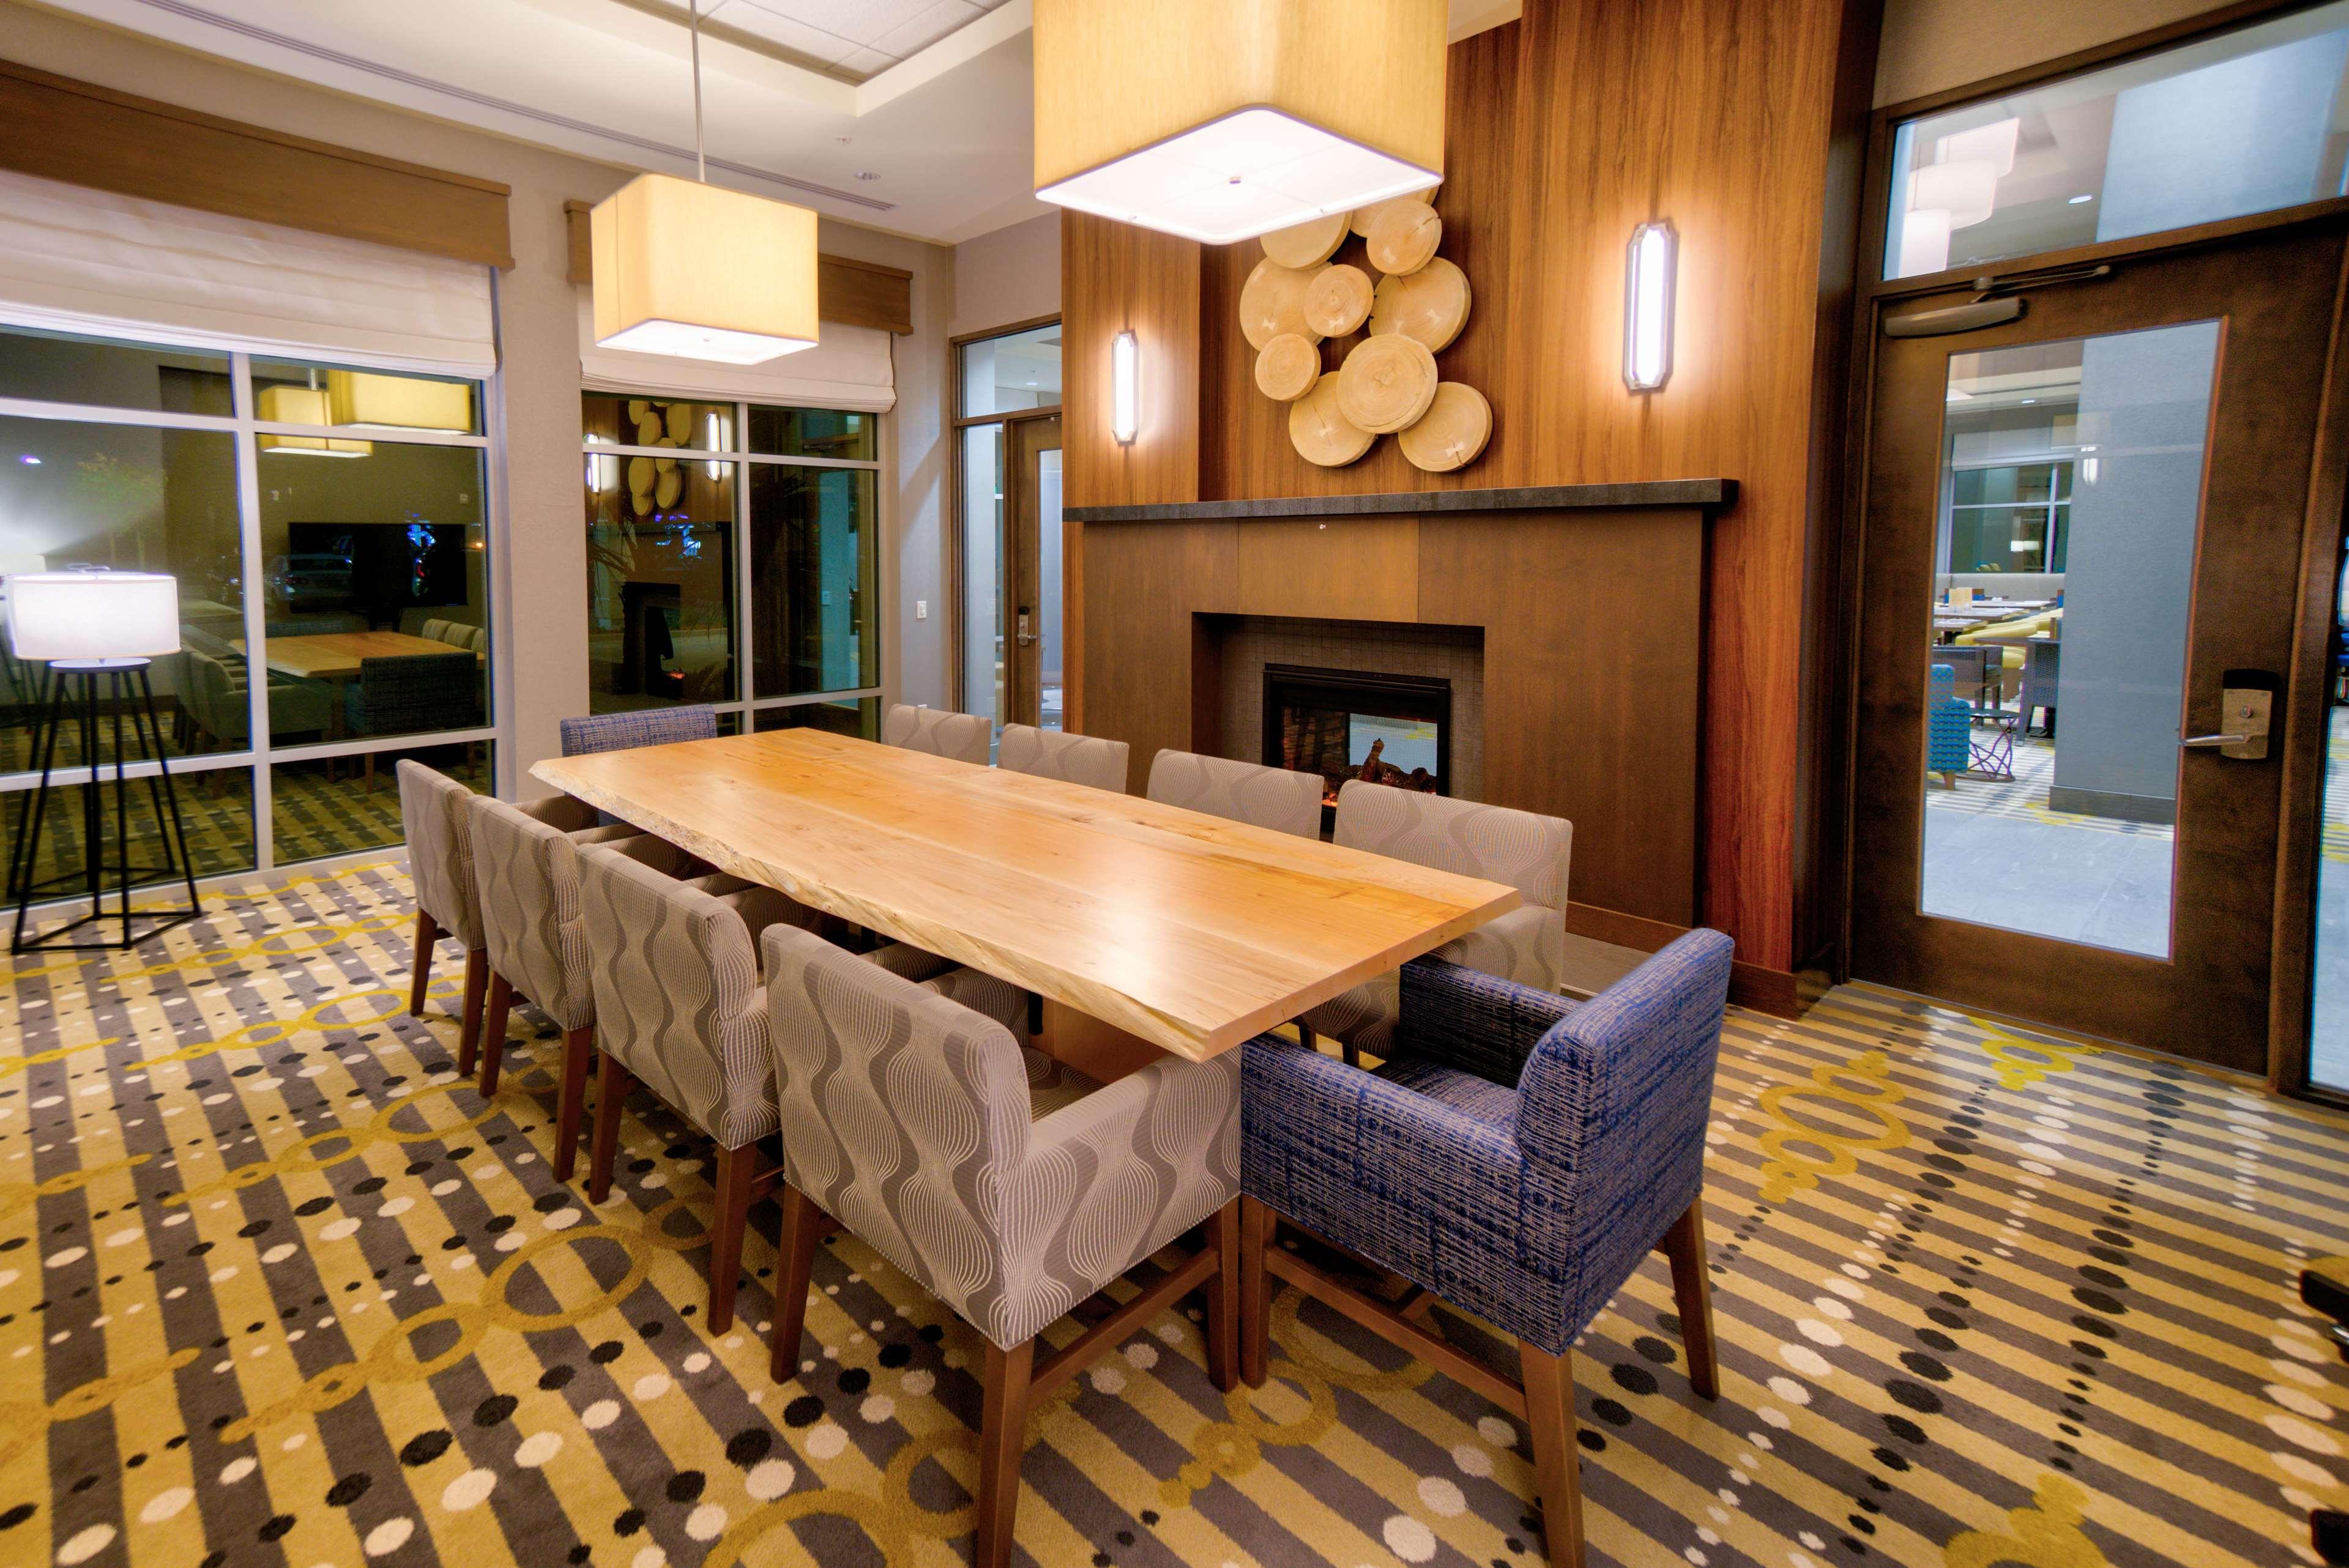 Hilton Garden Inn Santa Barbara/Goleta image 45